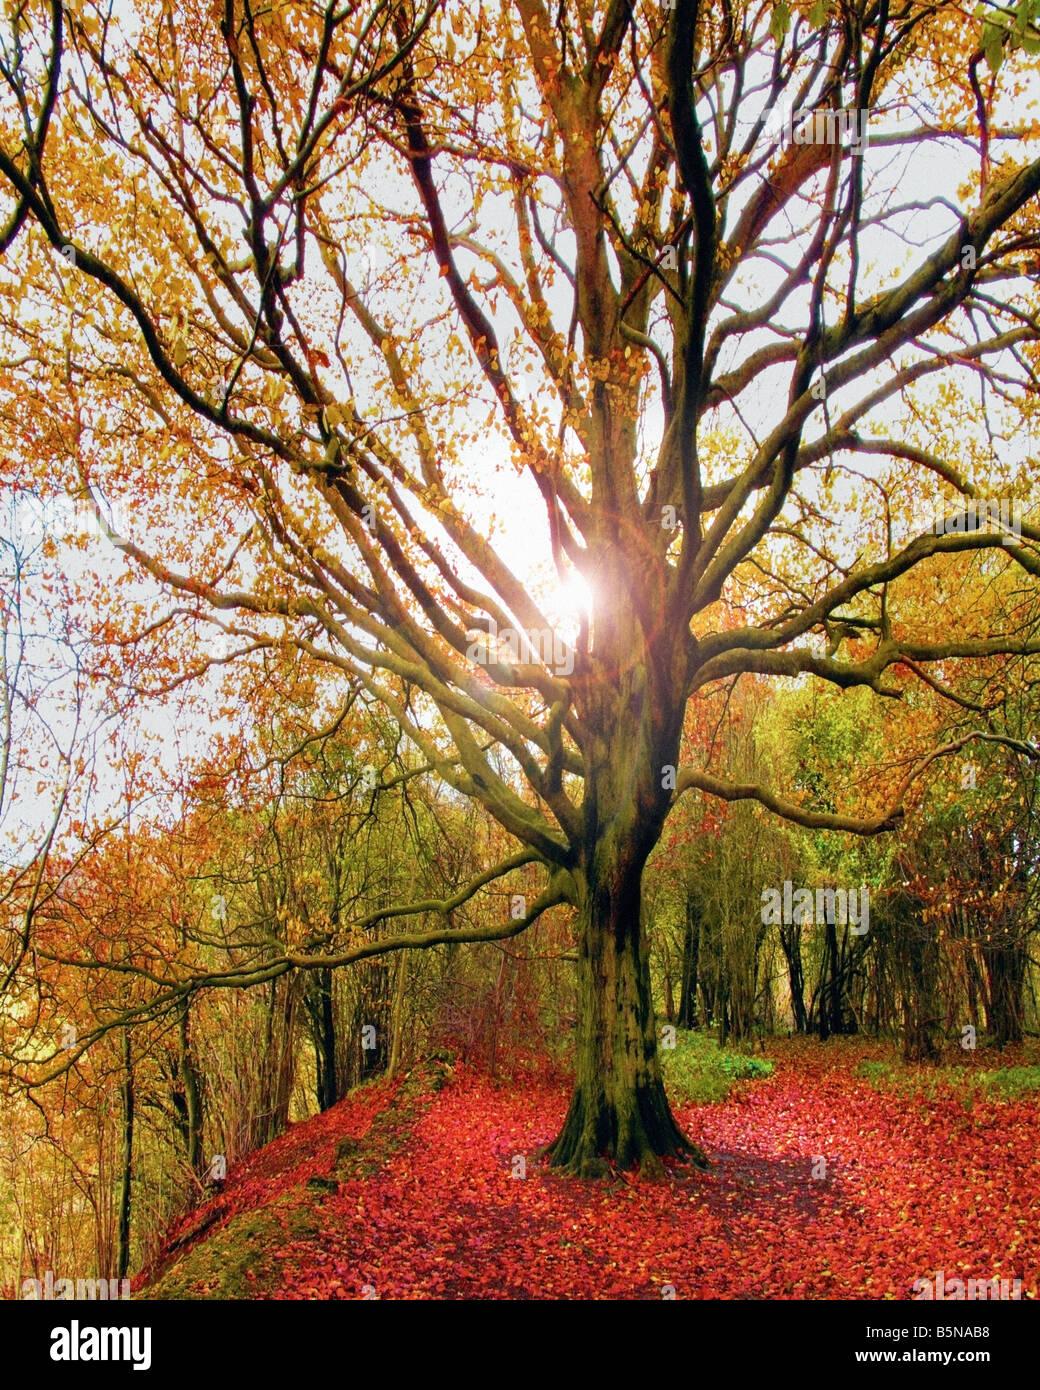 GB - GLOUCESTERSHIRE: Herbst Szene am Crickley Hill Country Park Stockbild